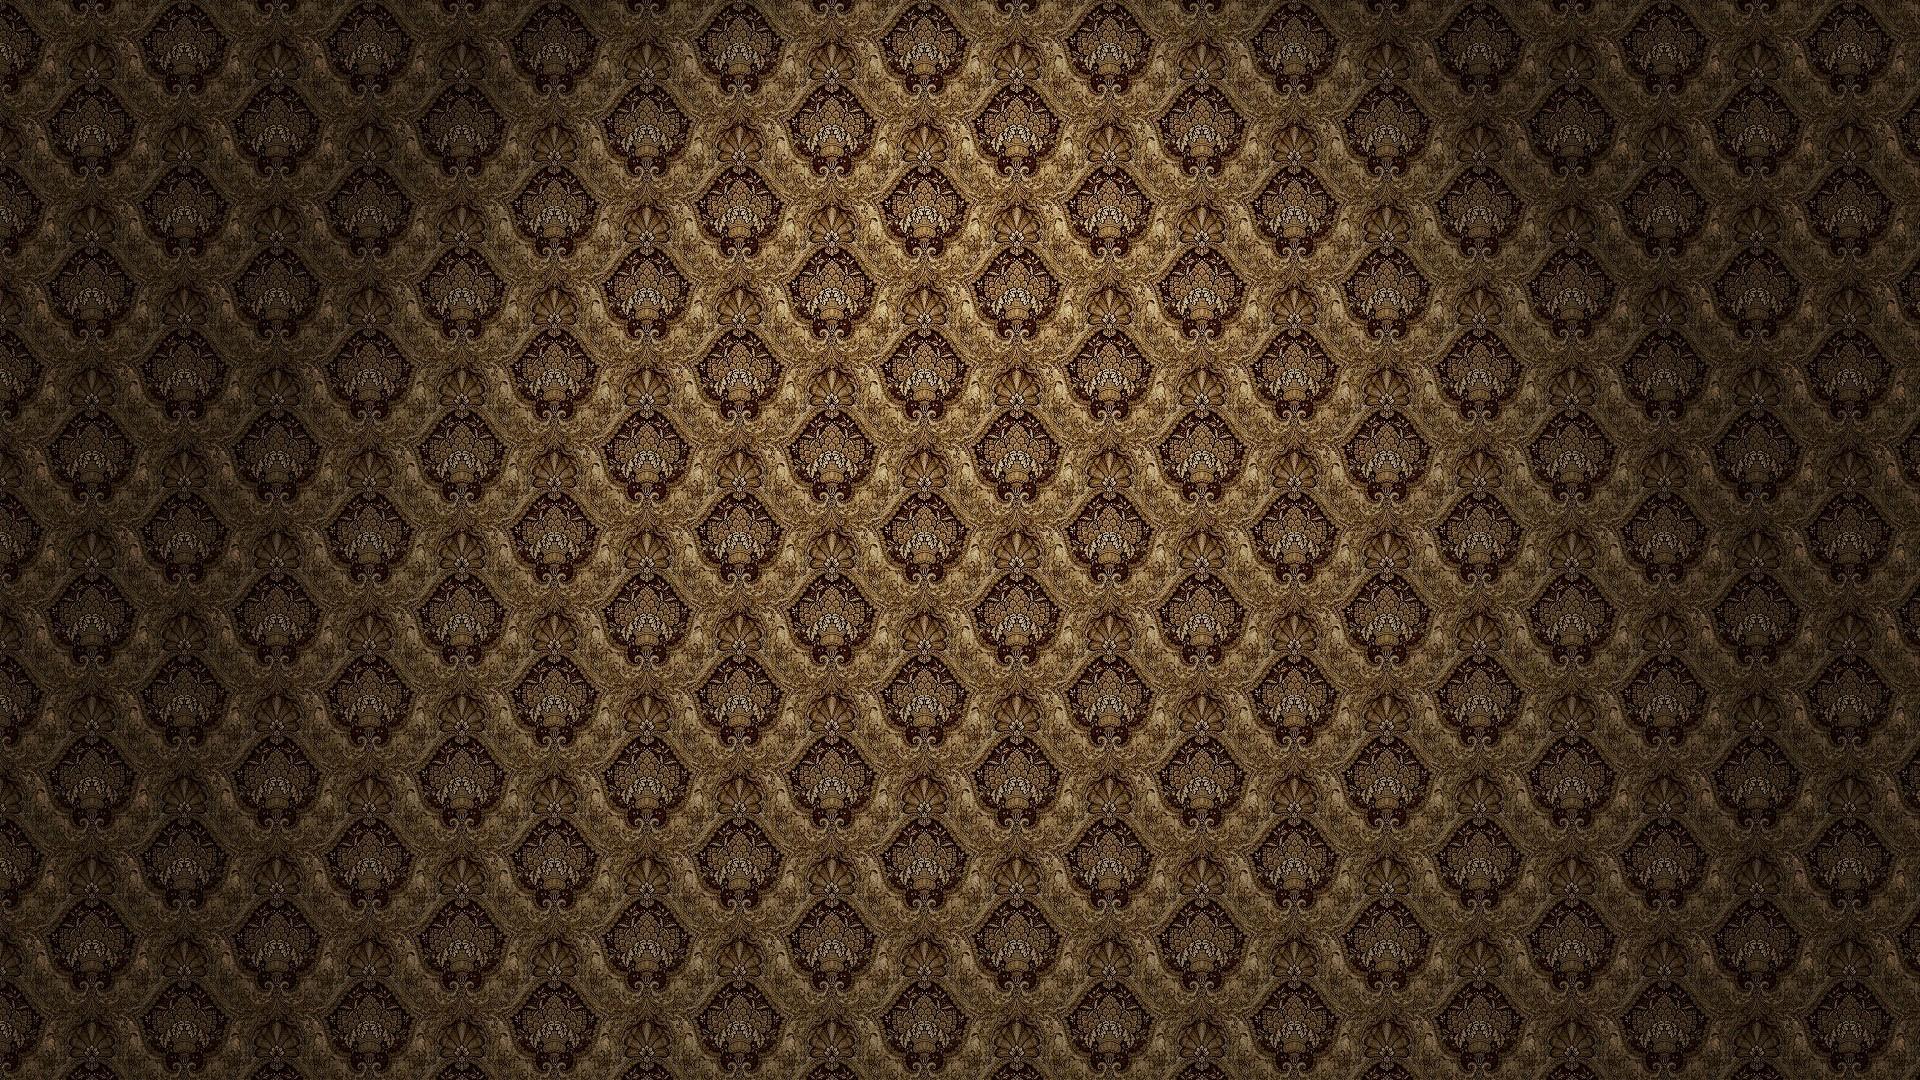 gold and black background  u00b7 u2460 download free hd wallpapers